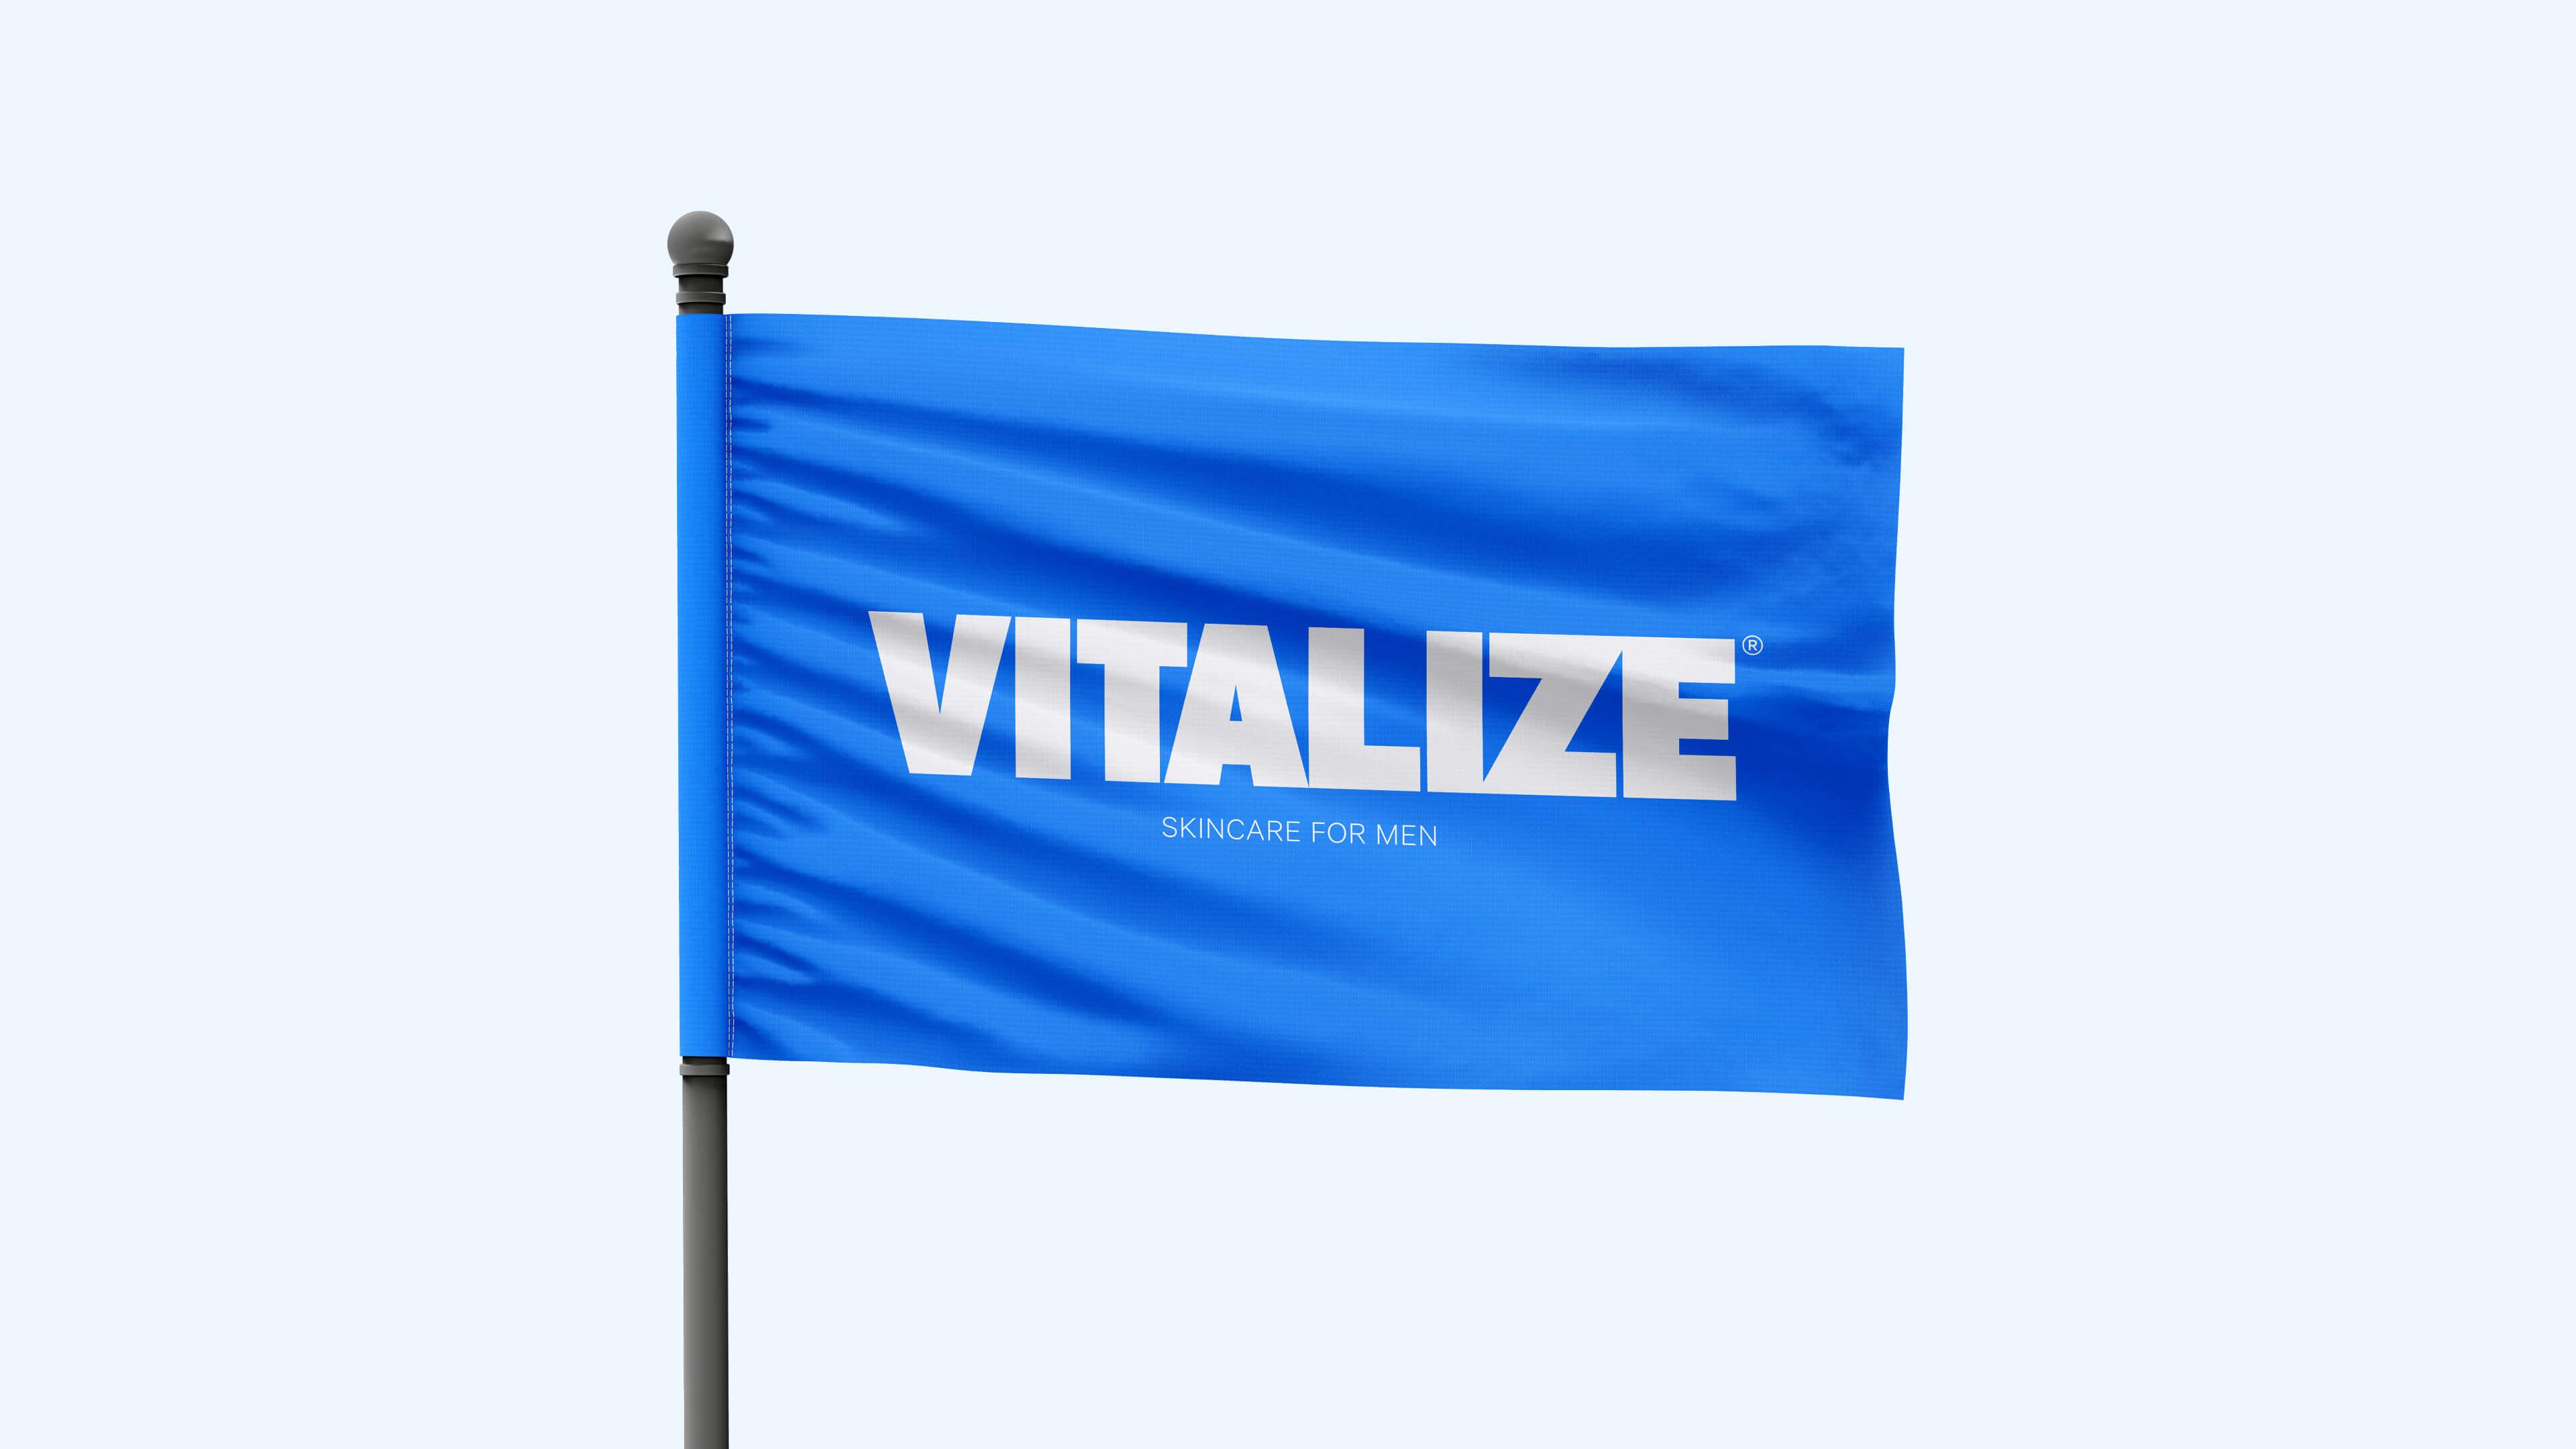 vitalize_001-new5